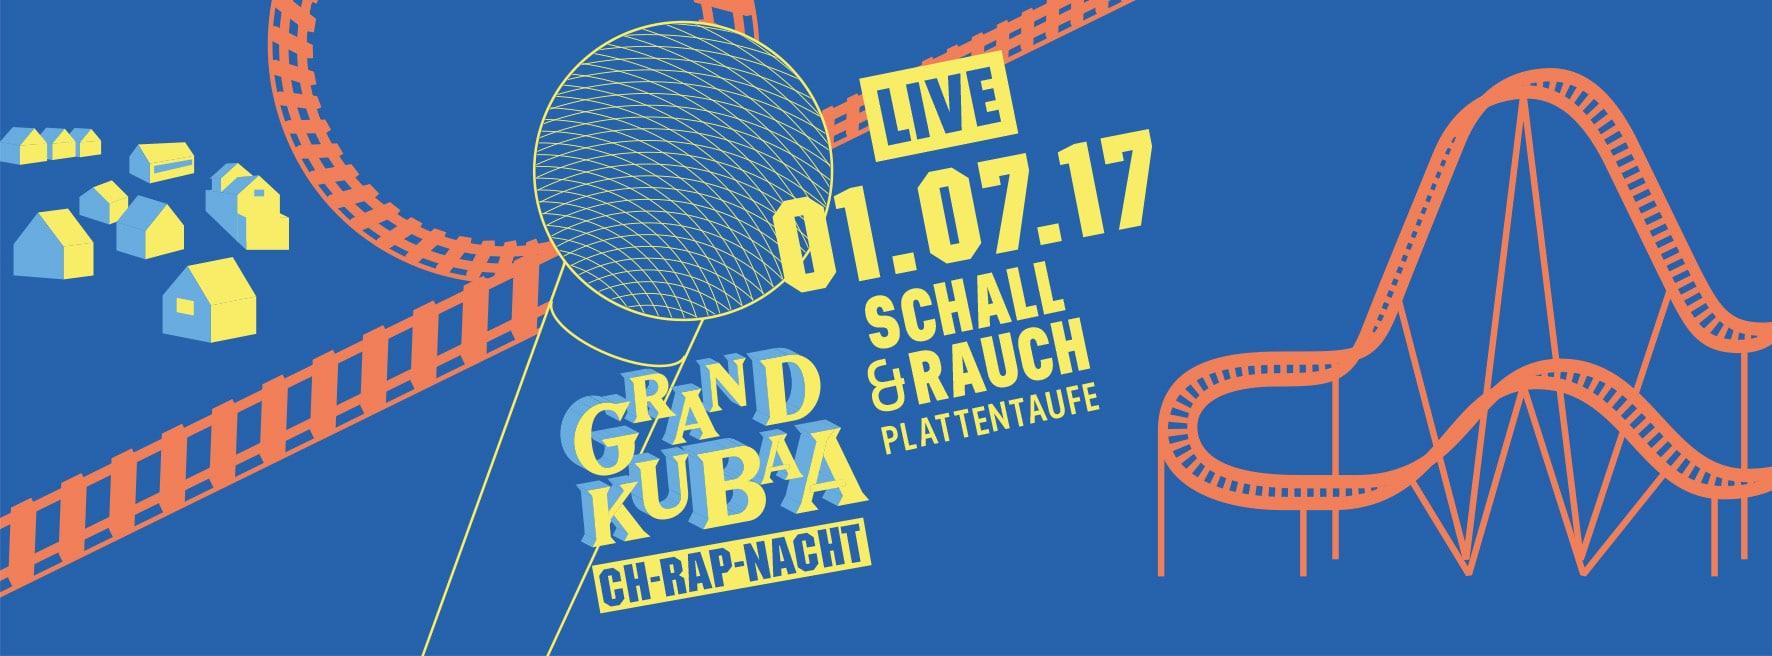 mit_liib_und_seel_plattentaufes_kubaa_flyer_2017